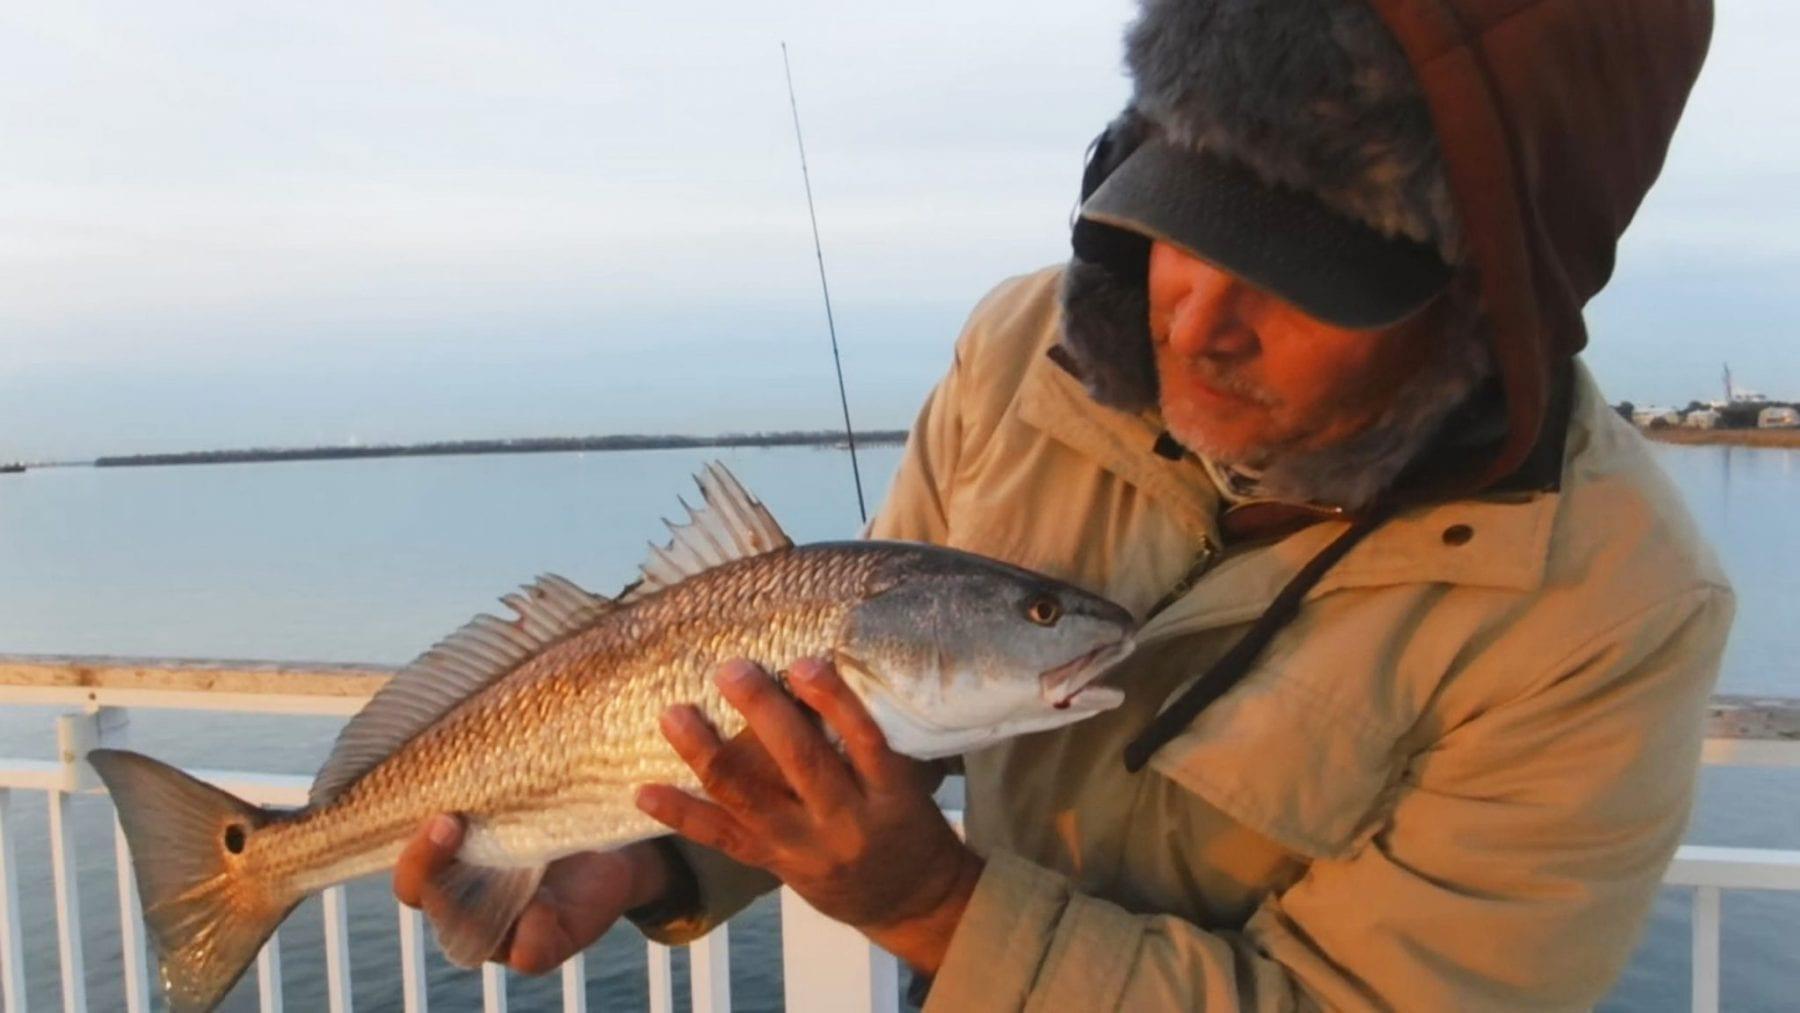 Mount pleasant pier april fishing forecast coastal for Mt pleasant fishing pier